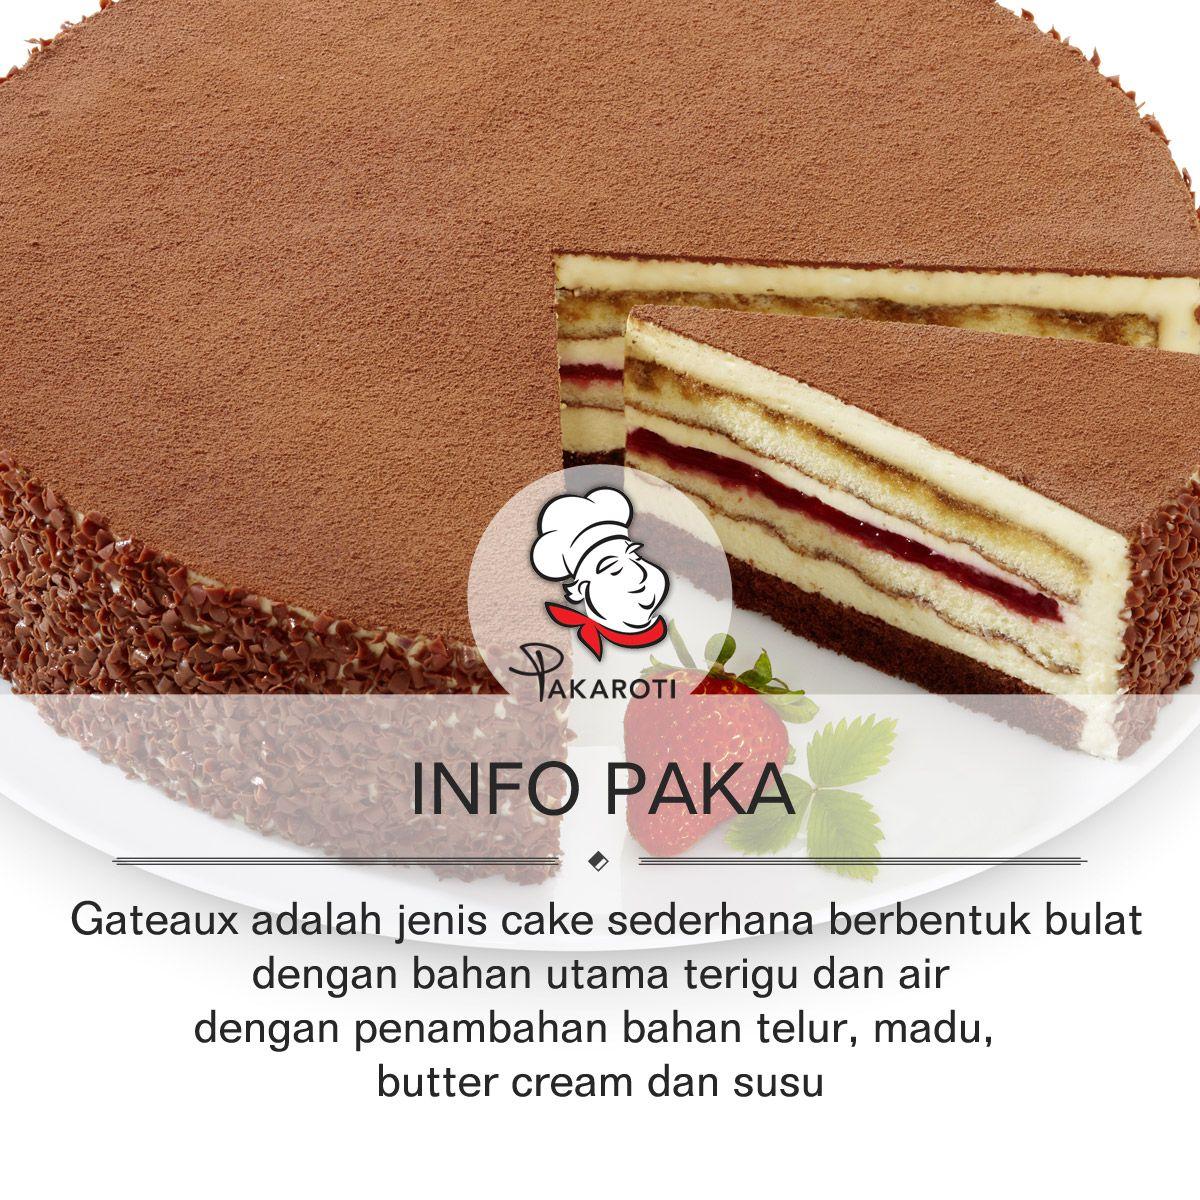 Di Perancis Cake Dikenal Istilah Gateaux Yang Merupakan Makanan Yang Berasal Dari Adonan Pastry Seperti Puff Pastry Shortcr Shortcrust Pastry Pastry Makanan